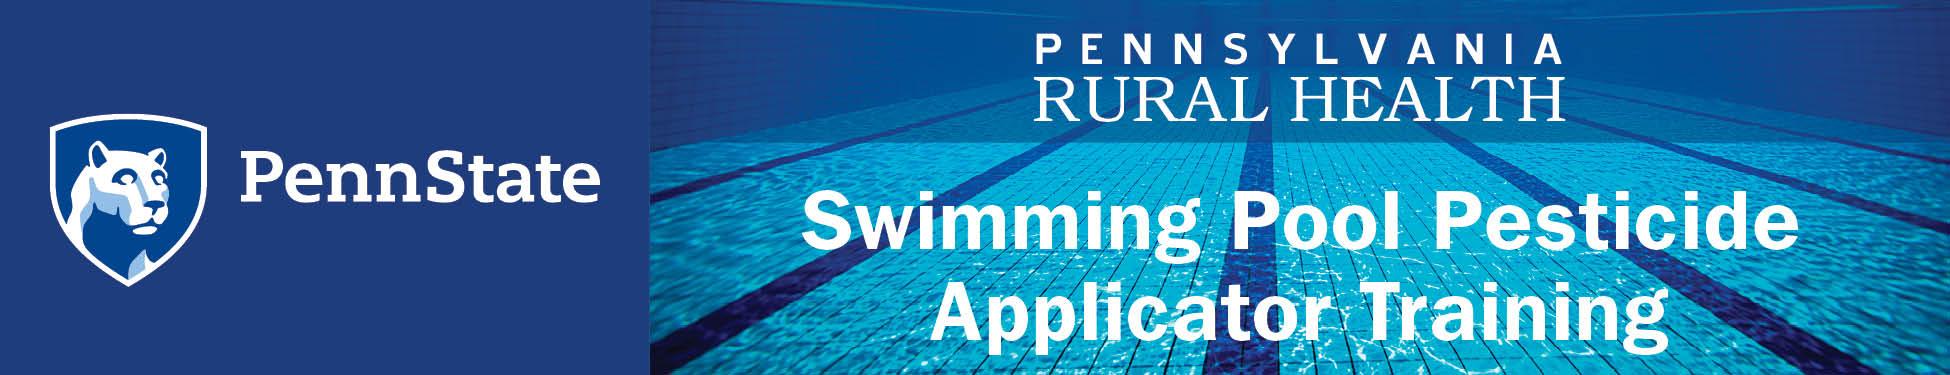 Swimming Pool Pesticide Applicator Training